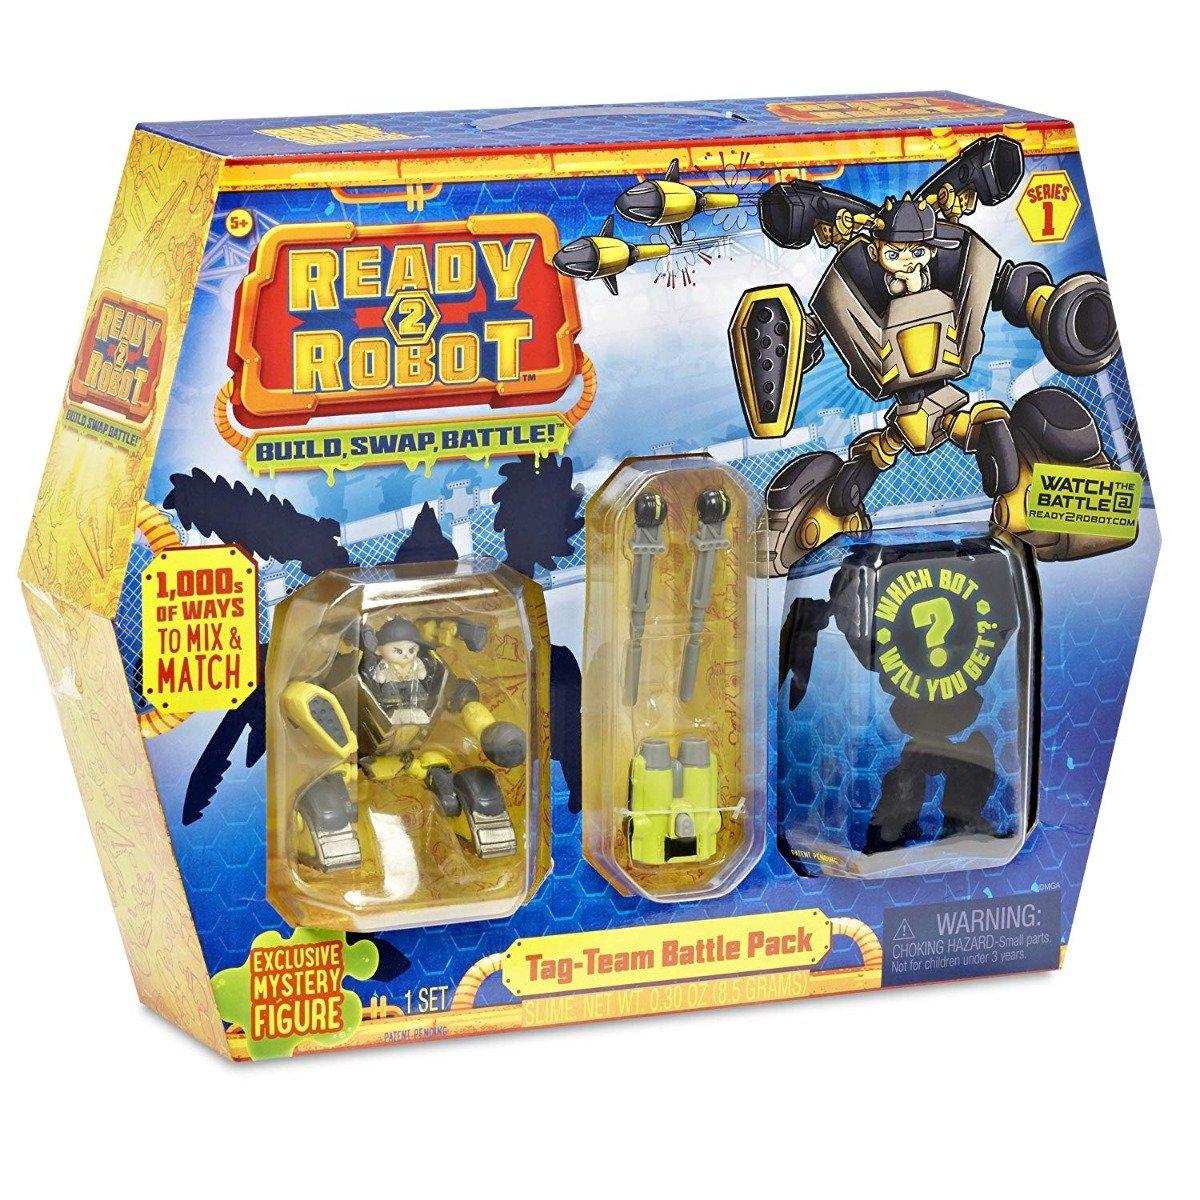 Set de lupta Ready2Robot Seria 1, Battle Pack - Tag Team (553885E5C) imagine 2021